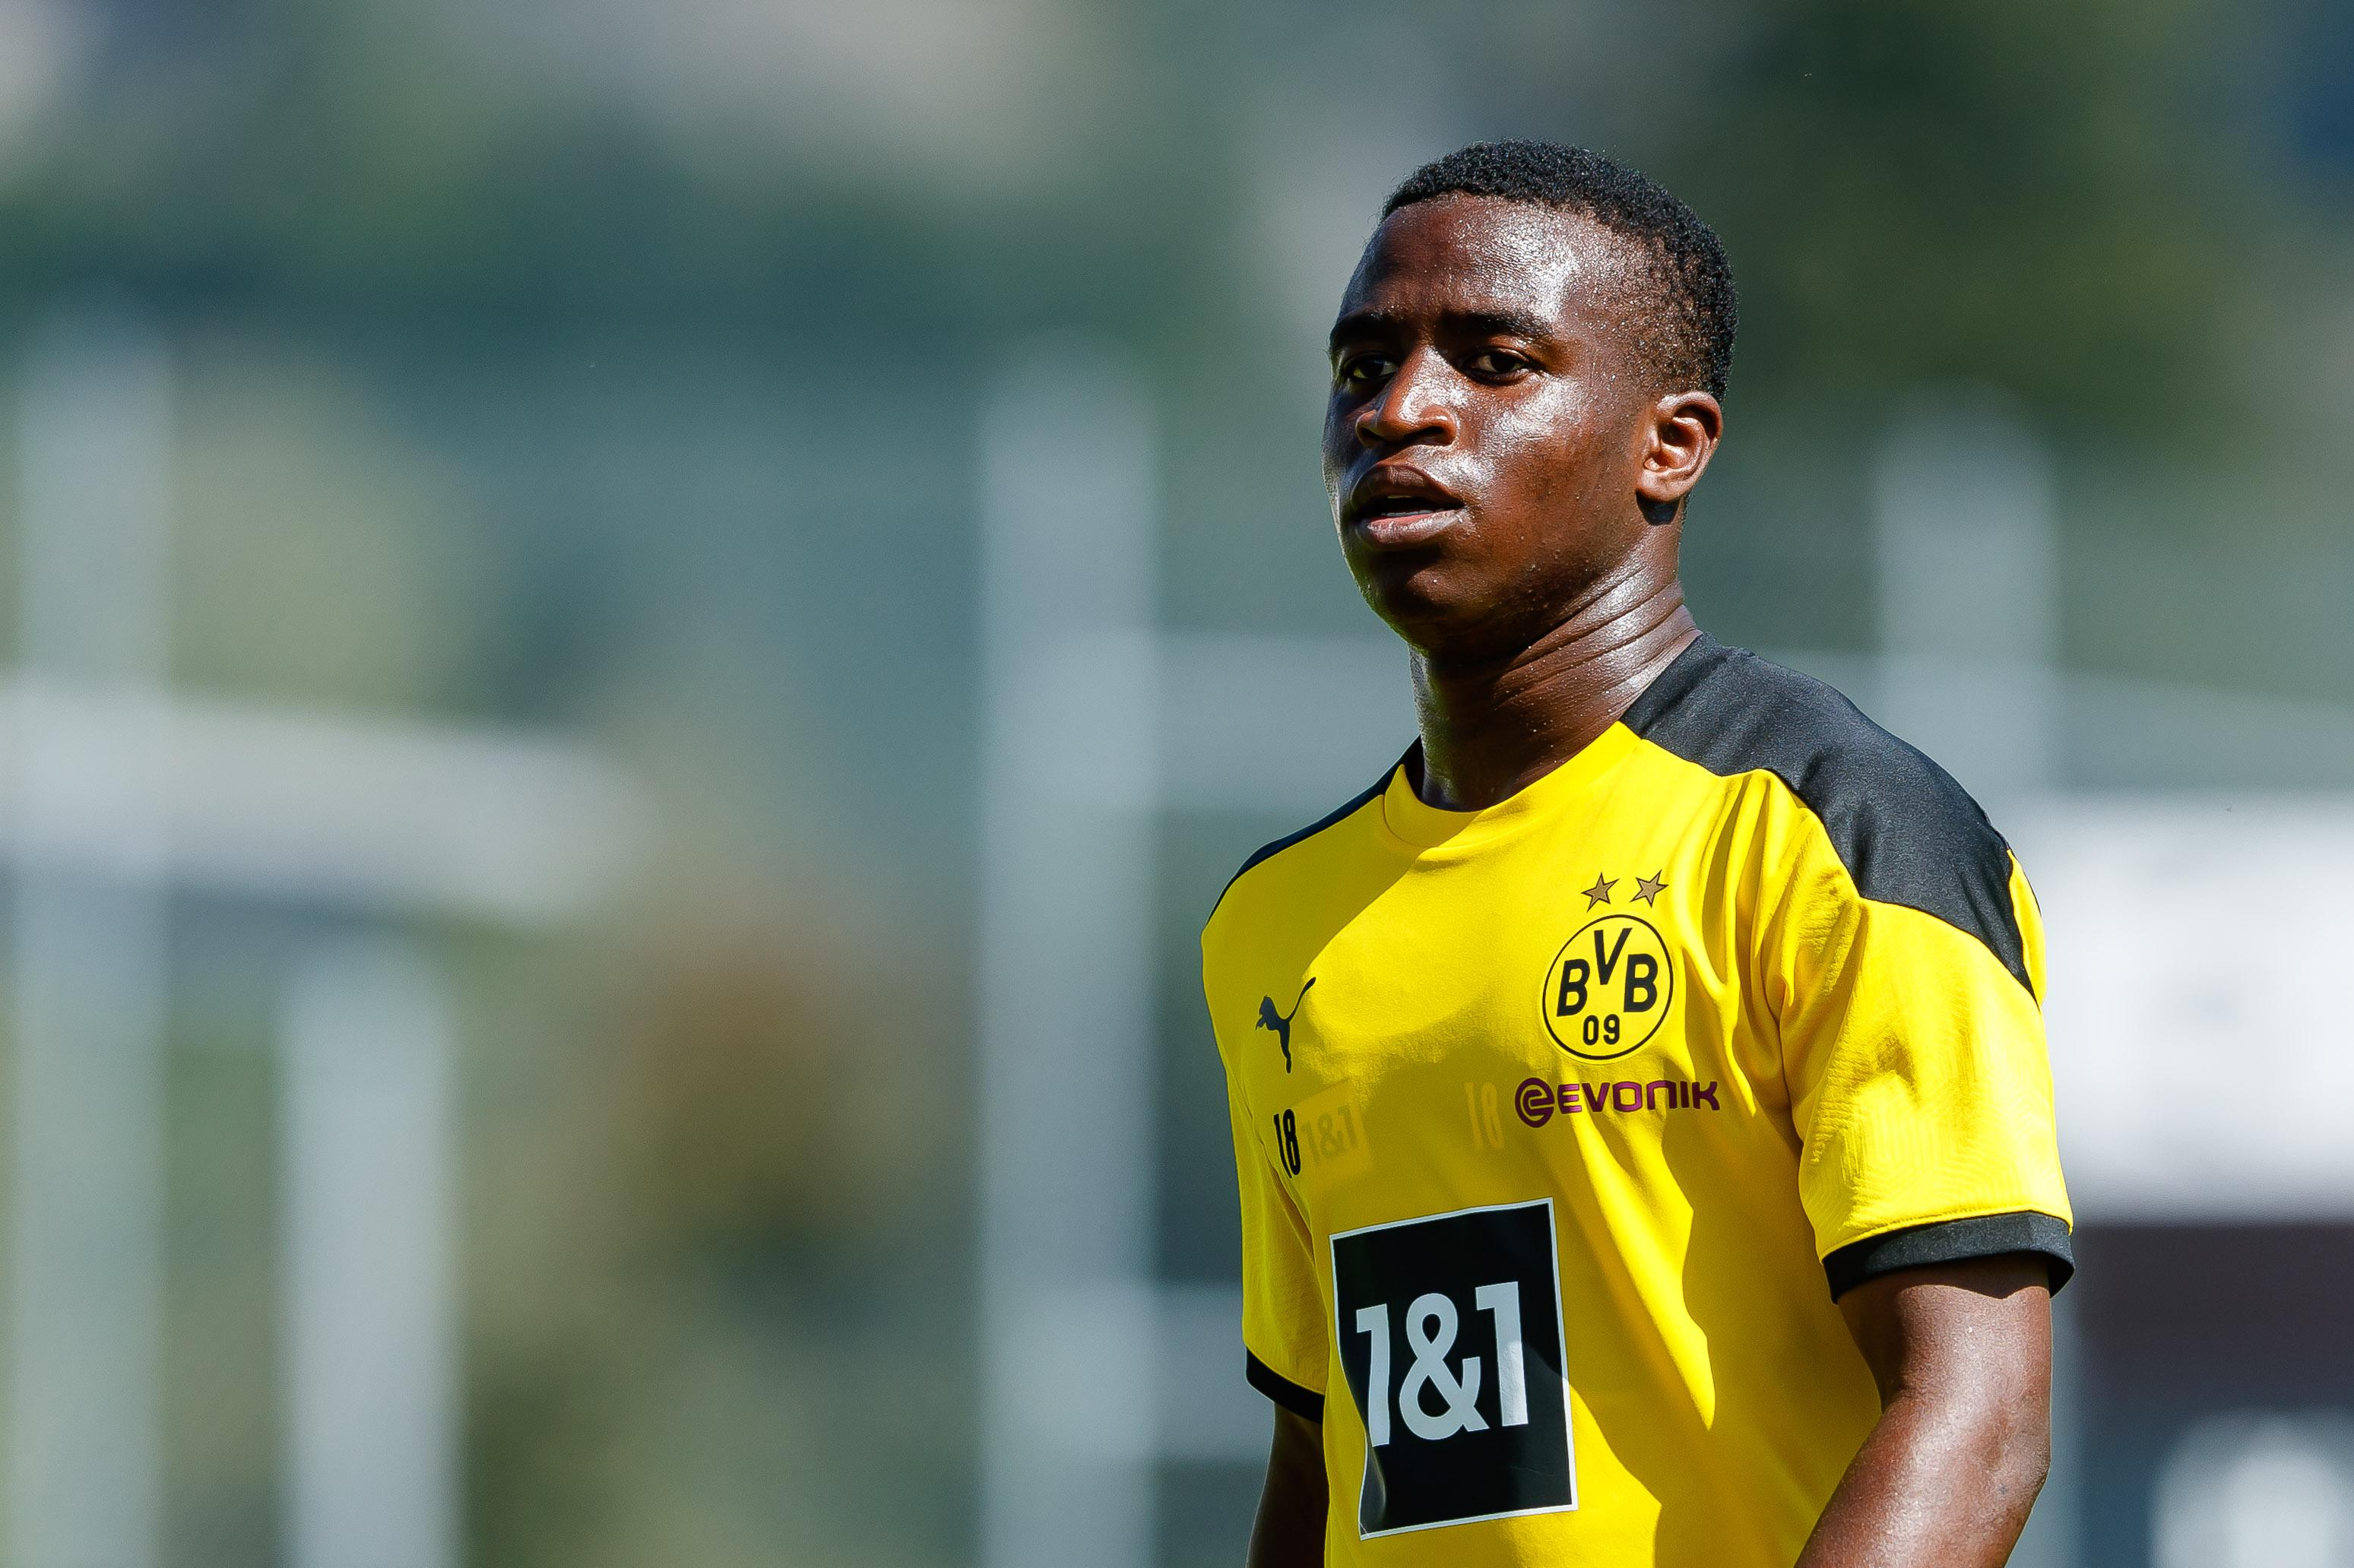 Youssoufa Moukoko: Gặp 'wunderkind' 16 tuổi của Borussia Dortmund